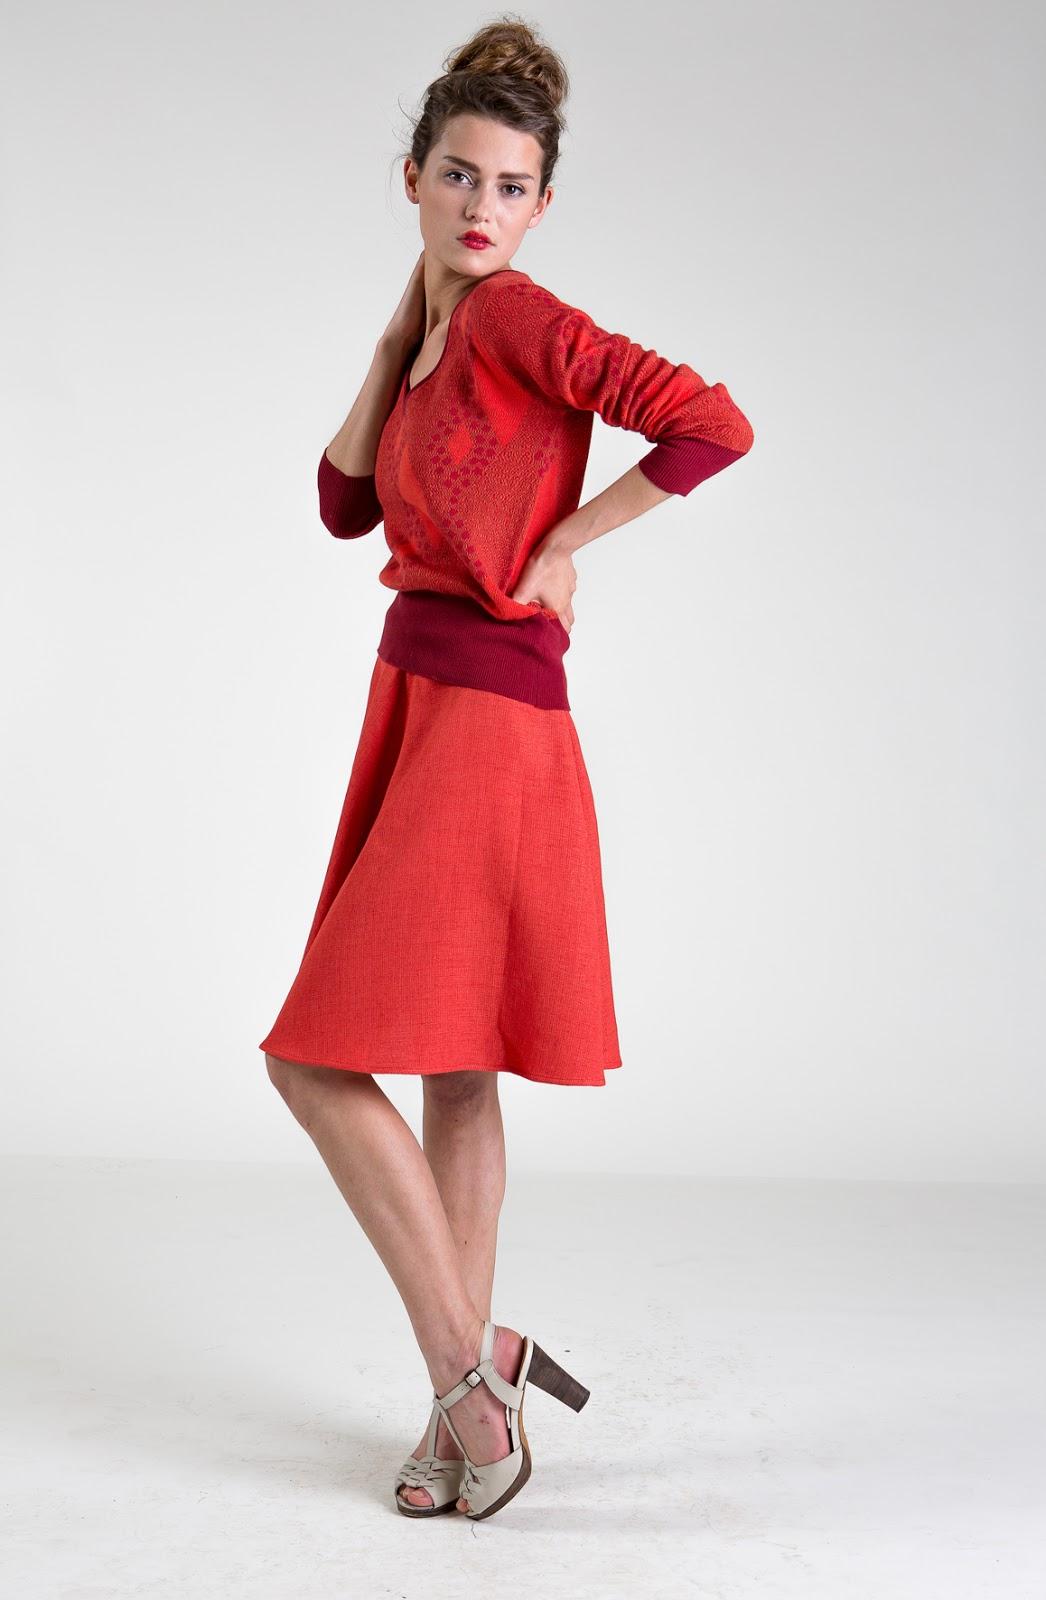 DiGuardo Boutique: Nathalie Vleeschouwer Spring / Summer 2013